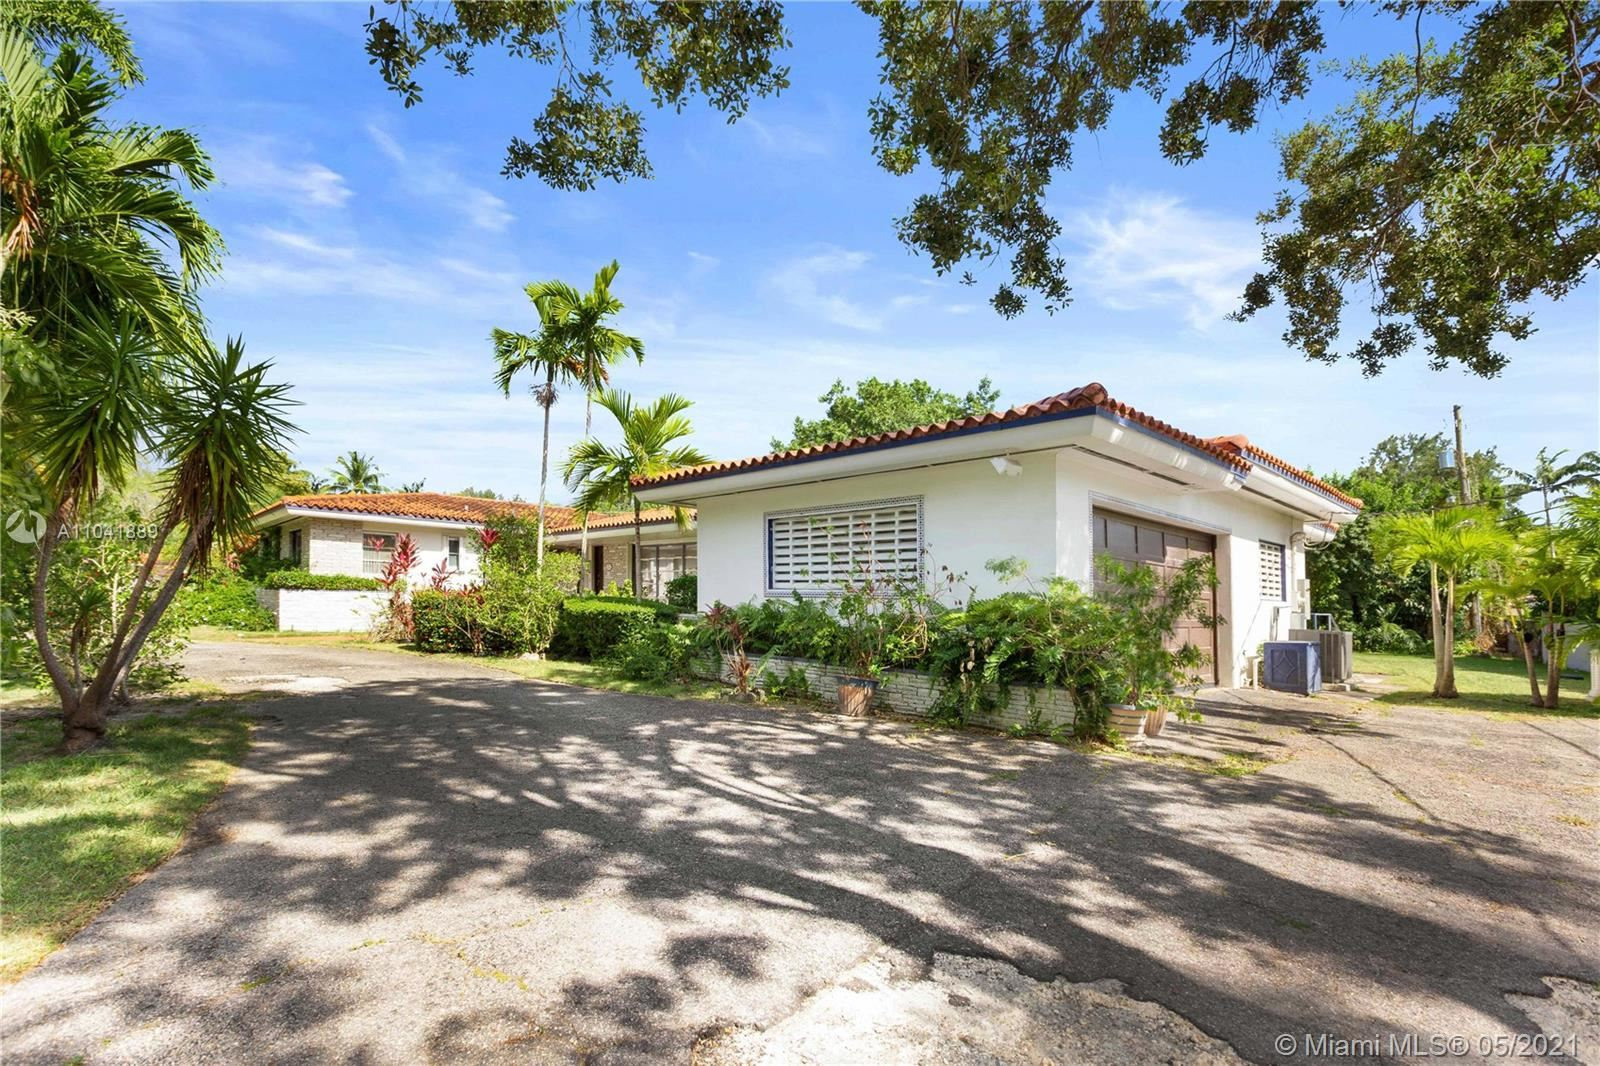 910 Valnera Ave, Coral Gables, FL 33146 - #: A11041889